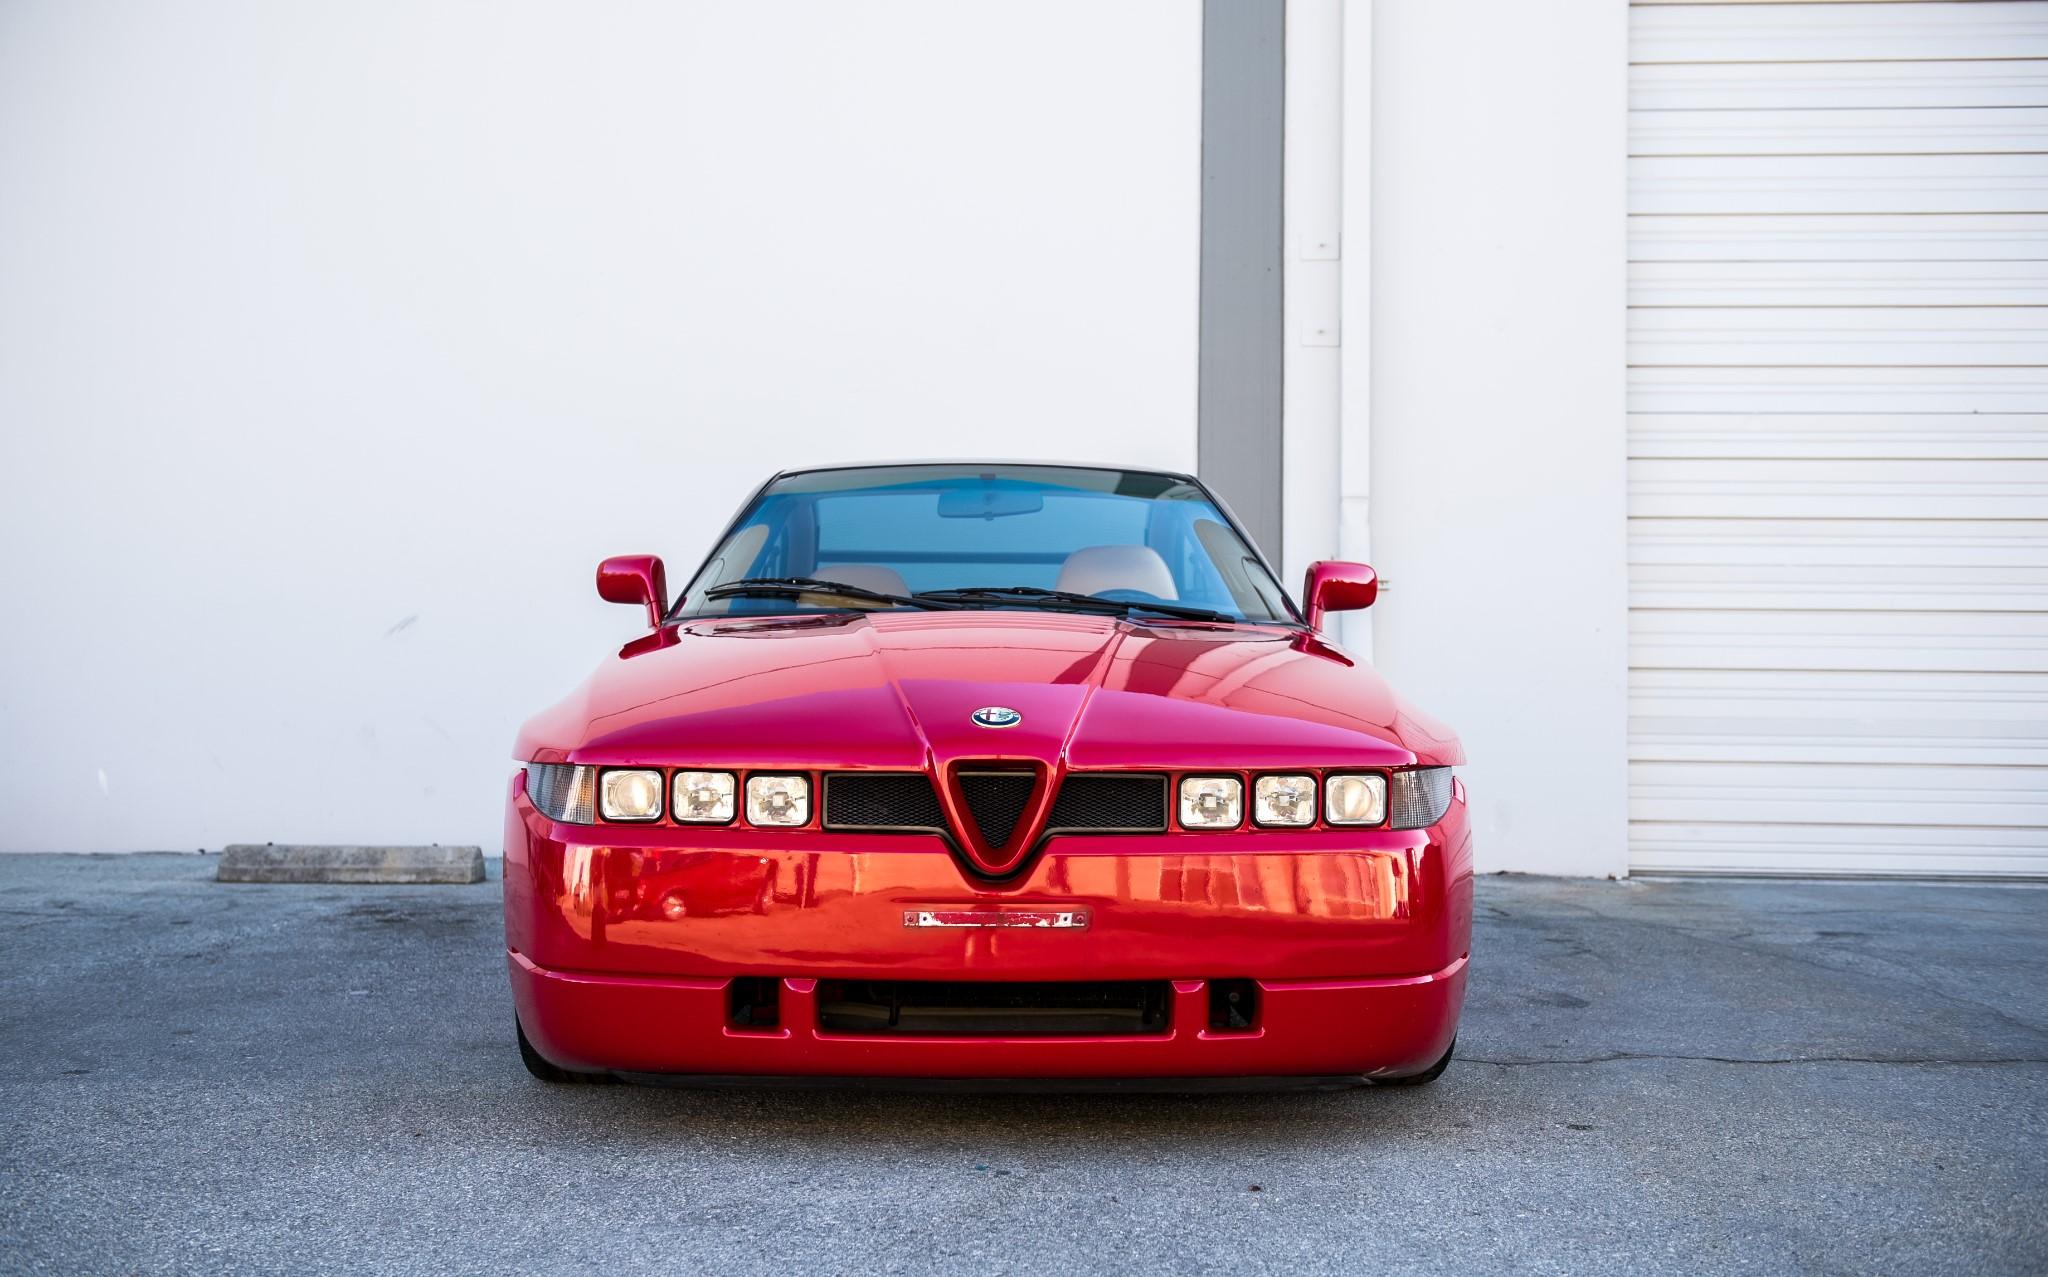 red 1991 Alfa Romeo SZ front